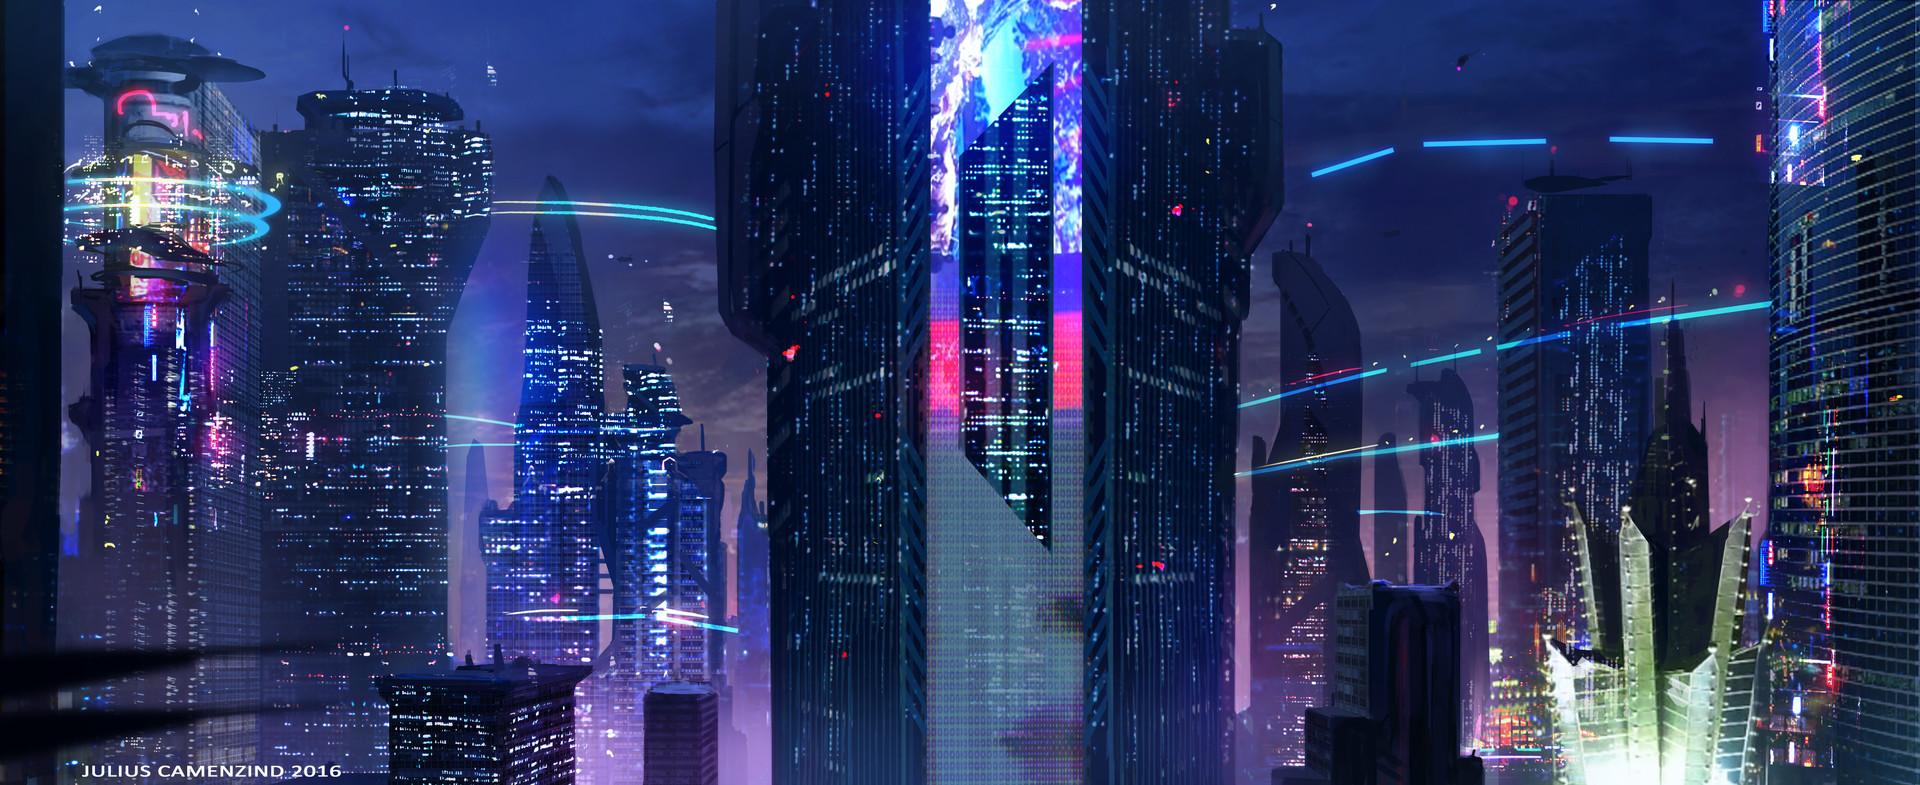 City Skyline Wallpaper Hd Artstation Cyberpunk Sci Fi Julius Camenzind